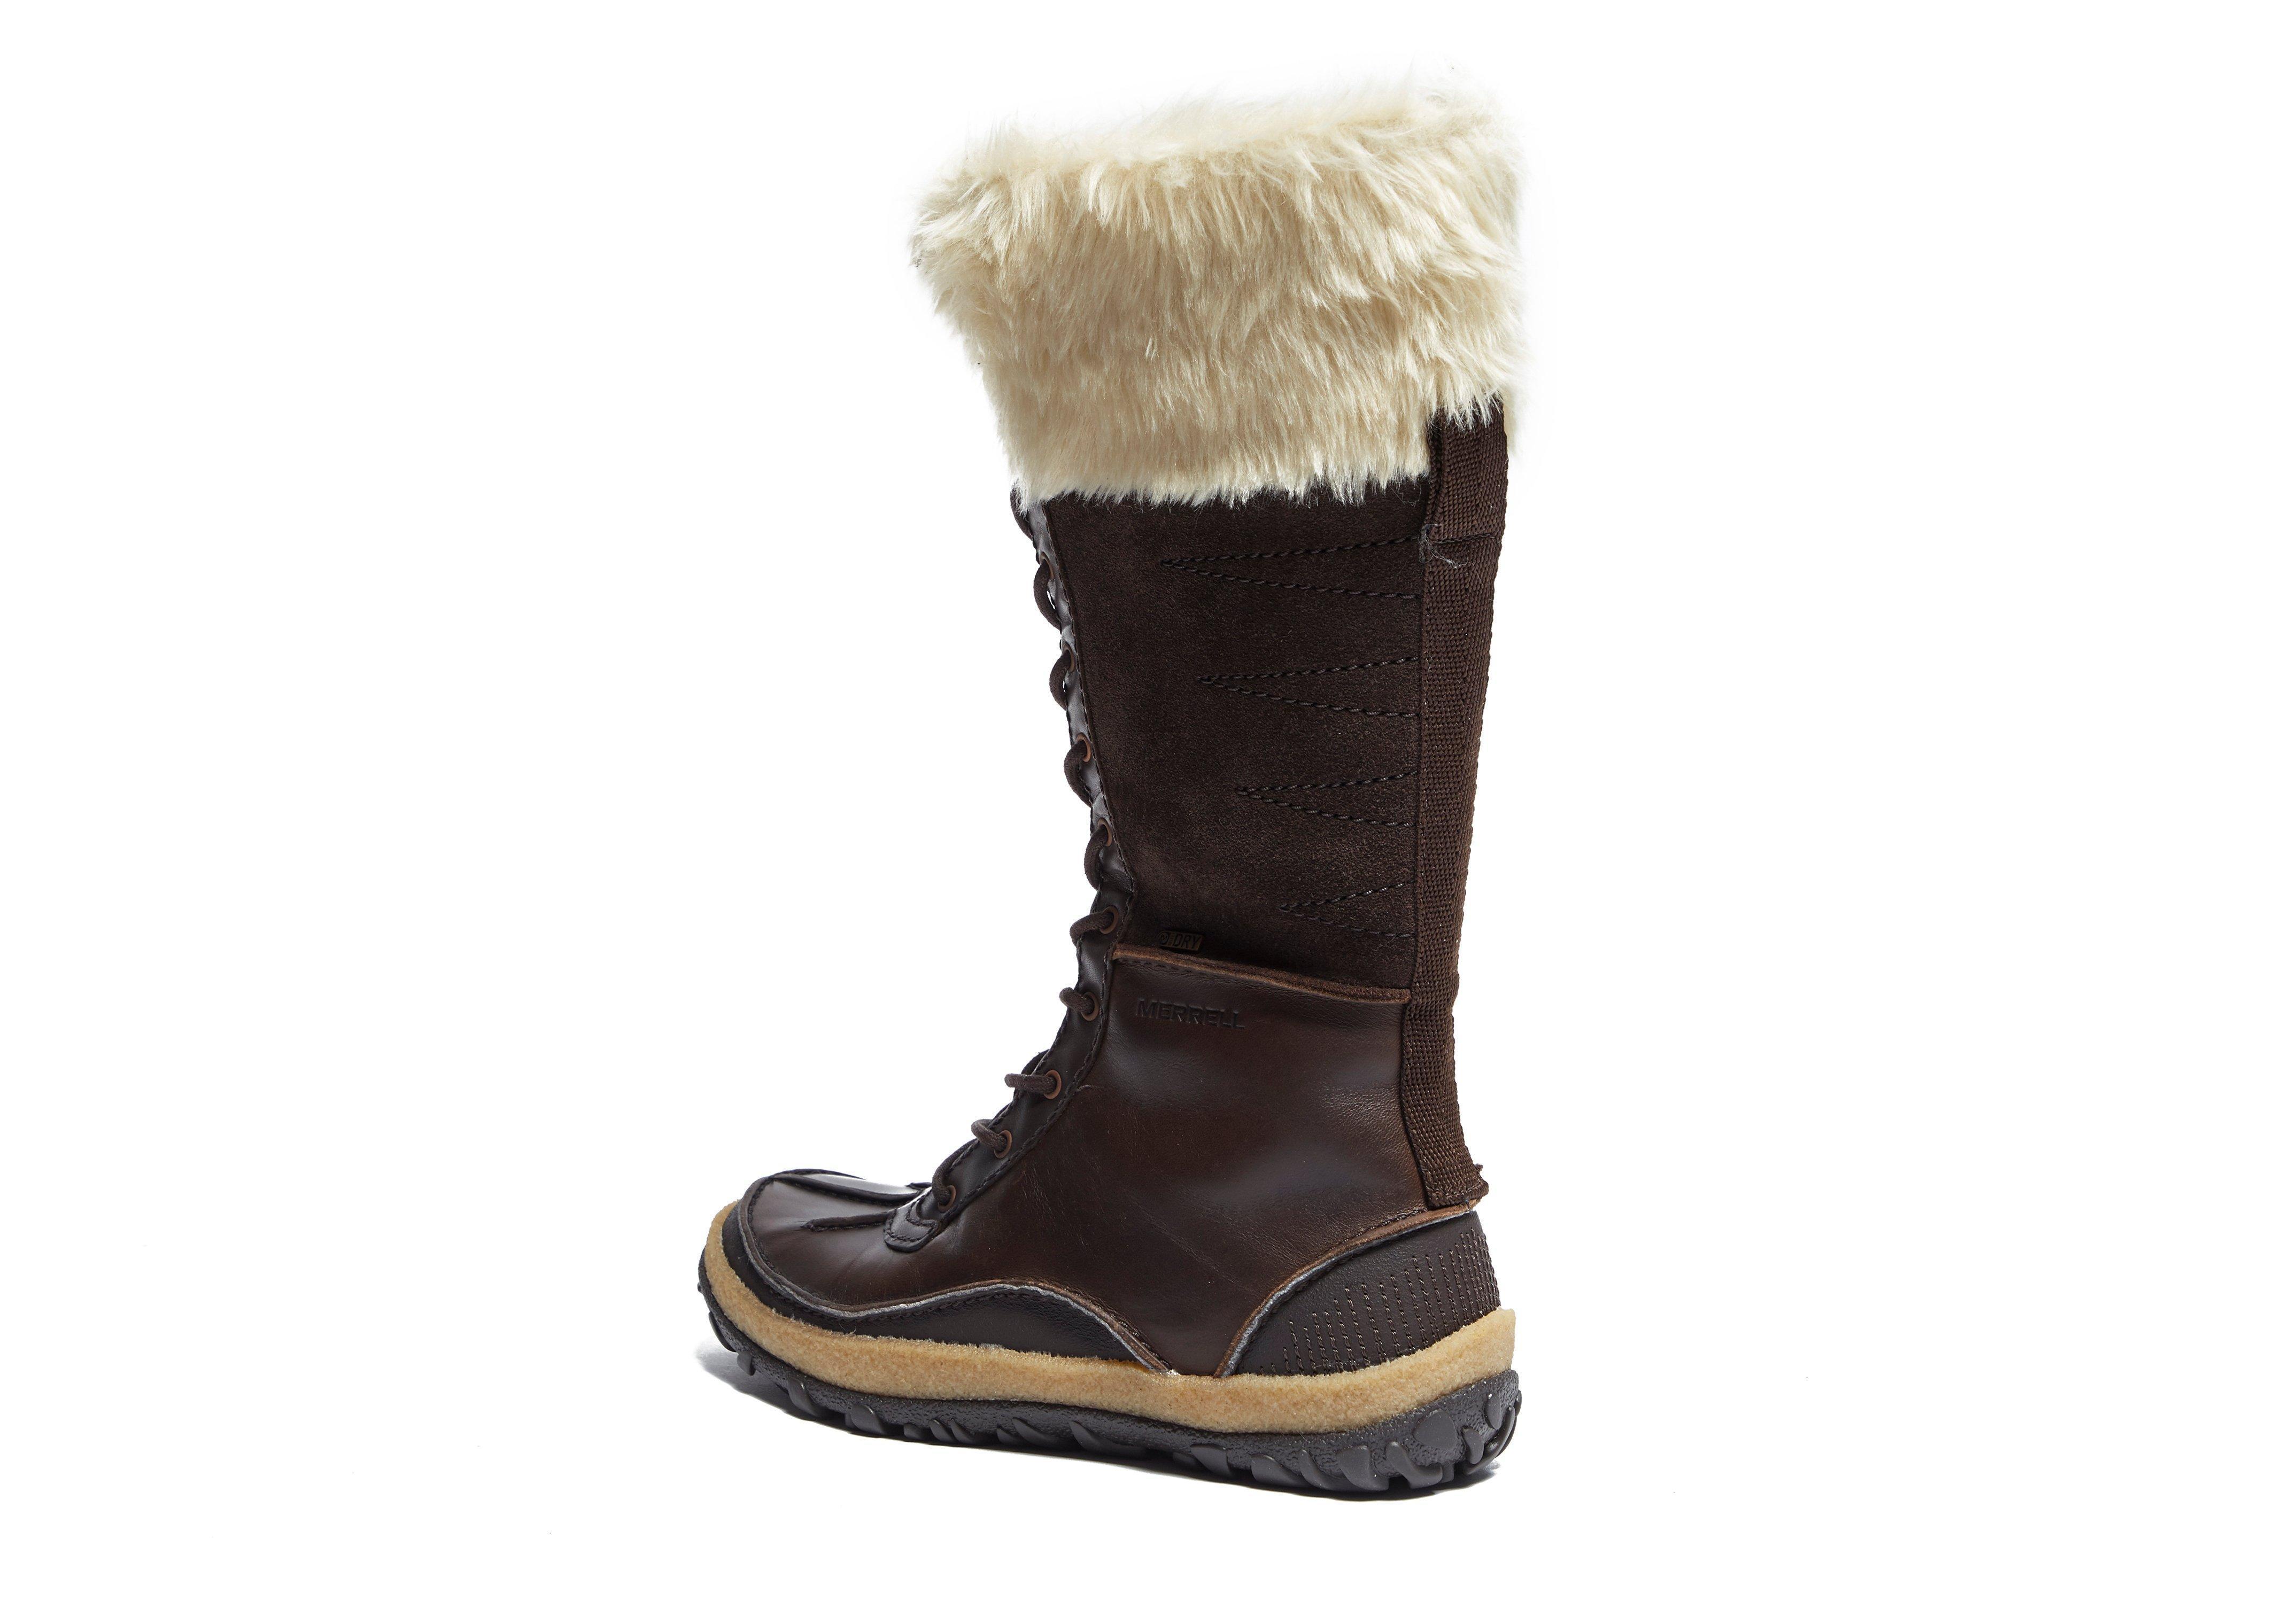 a1a7fddf916 Lyst - Merrell Tremblant Tall Polar Waterproof Women s in Brown